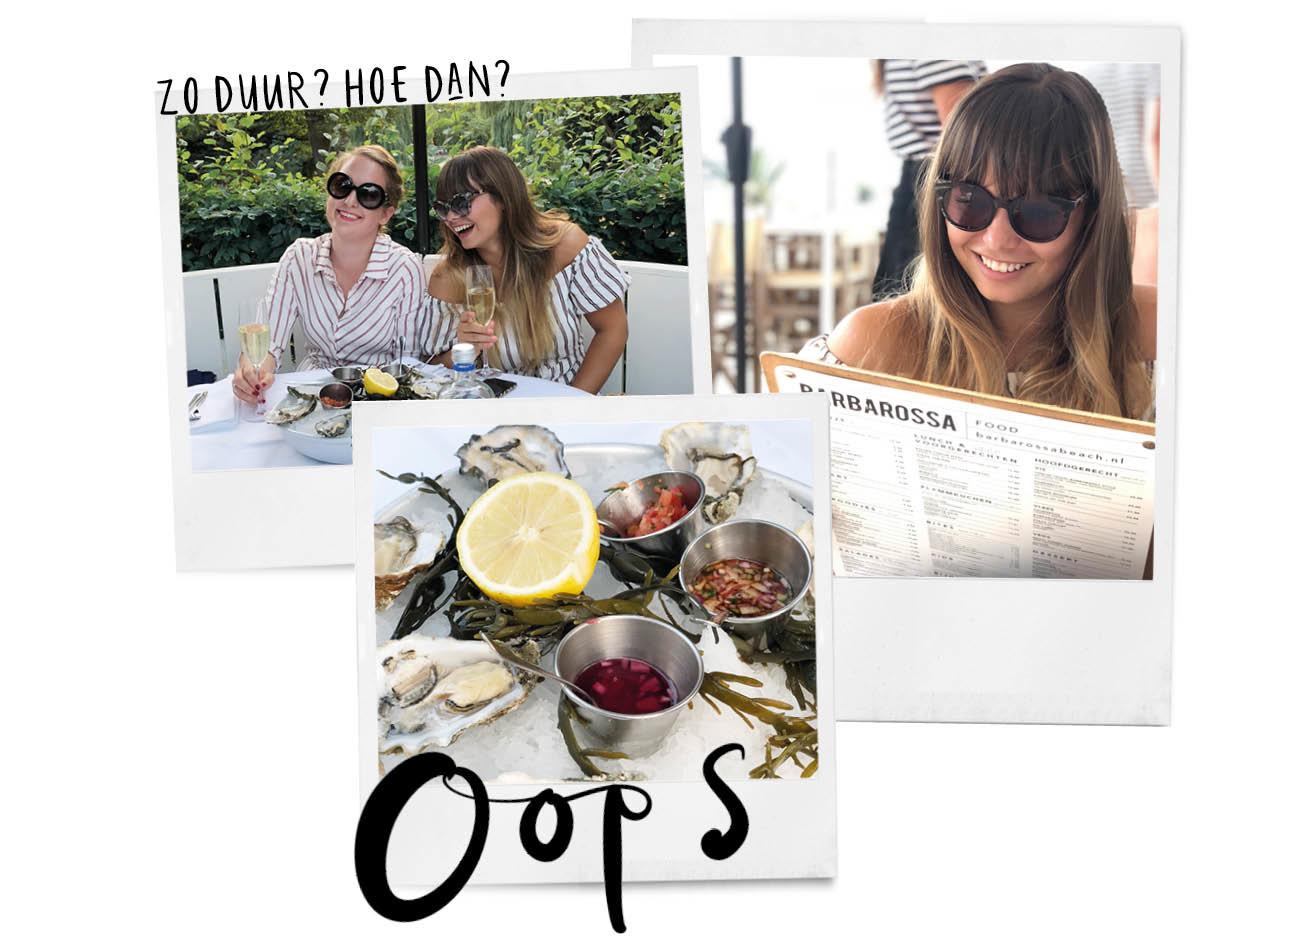 kiki lachend met eten oesters luxe duur met vriendin champagne drinken